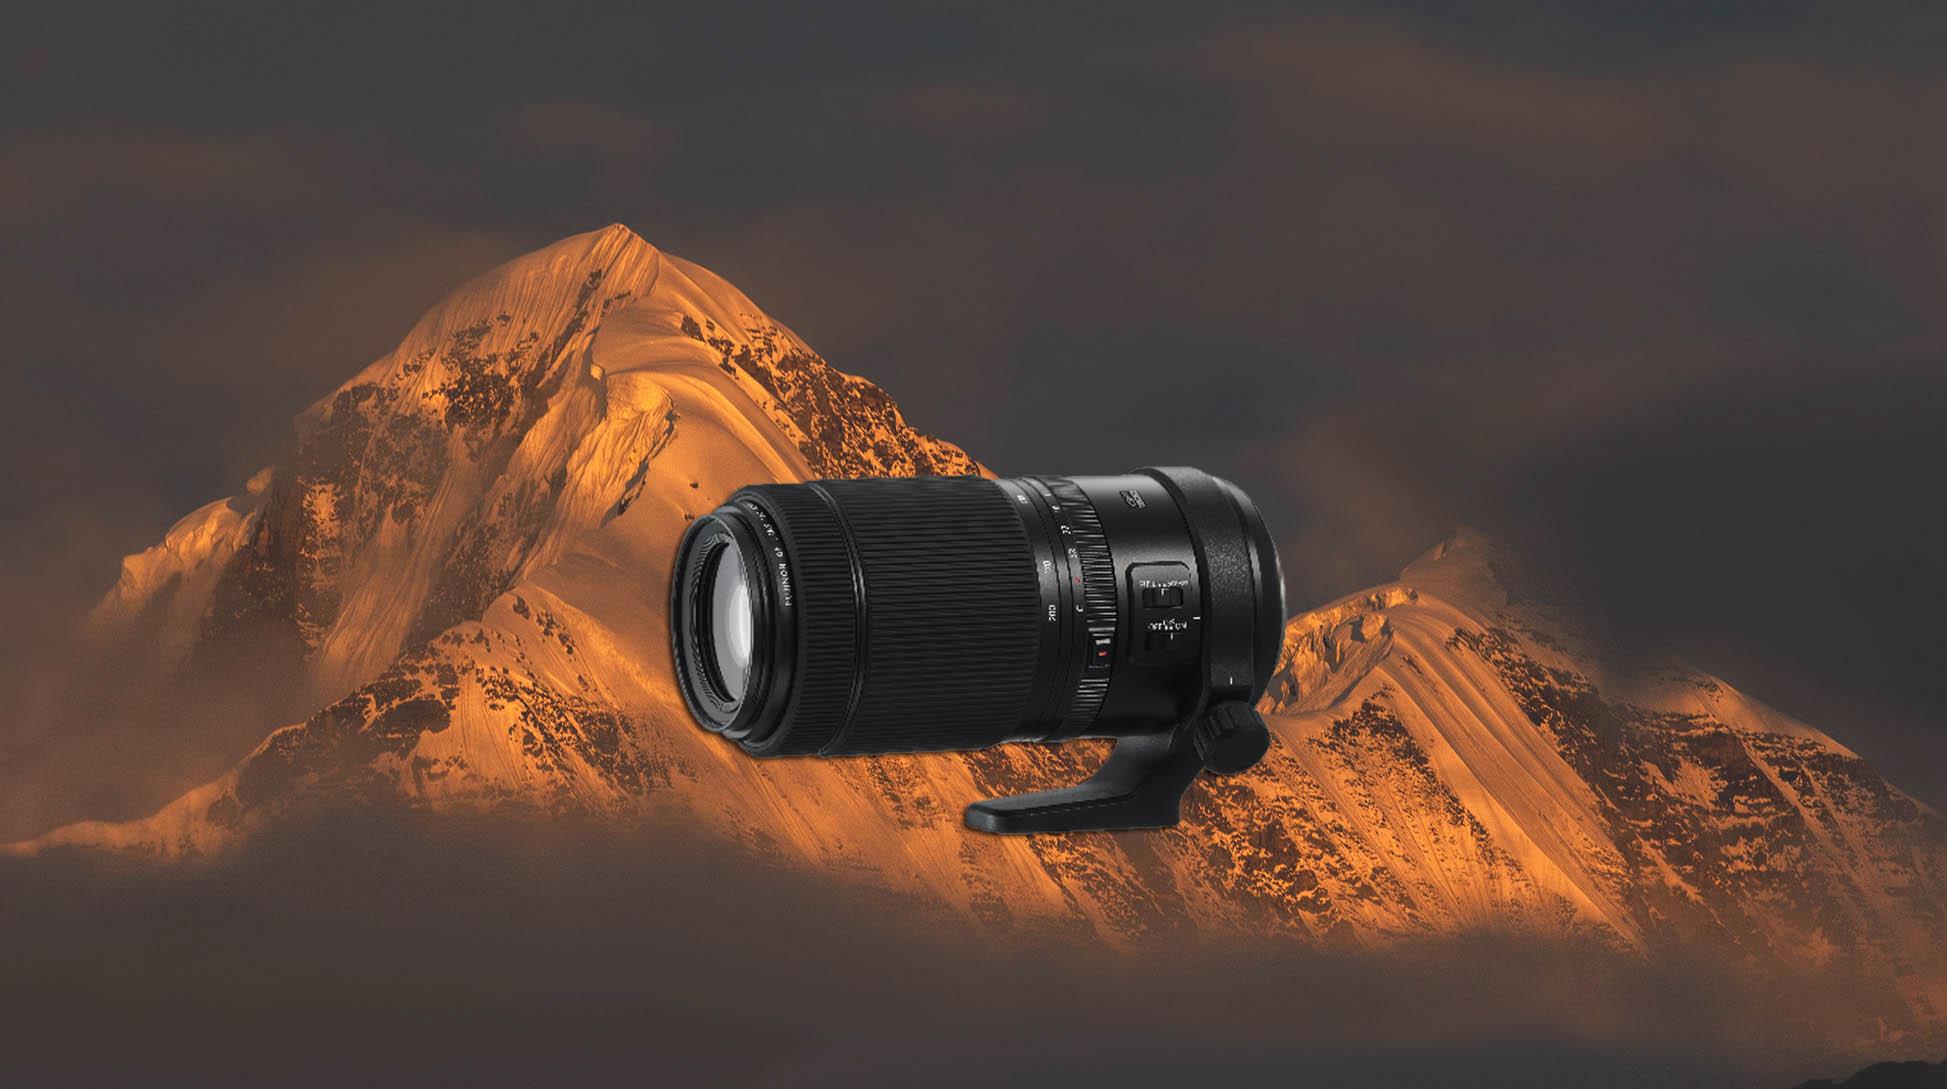 FujiFilm Telephoto Lens